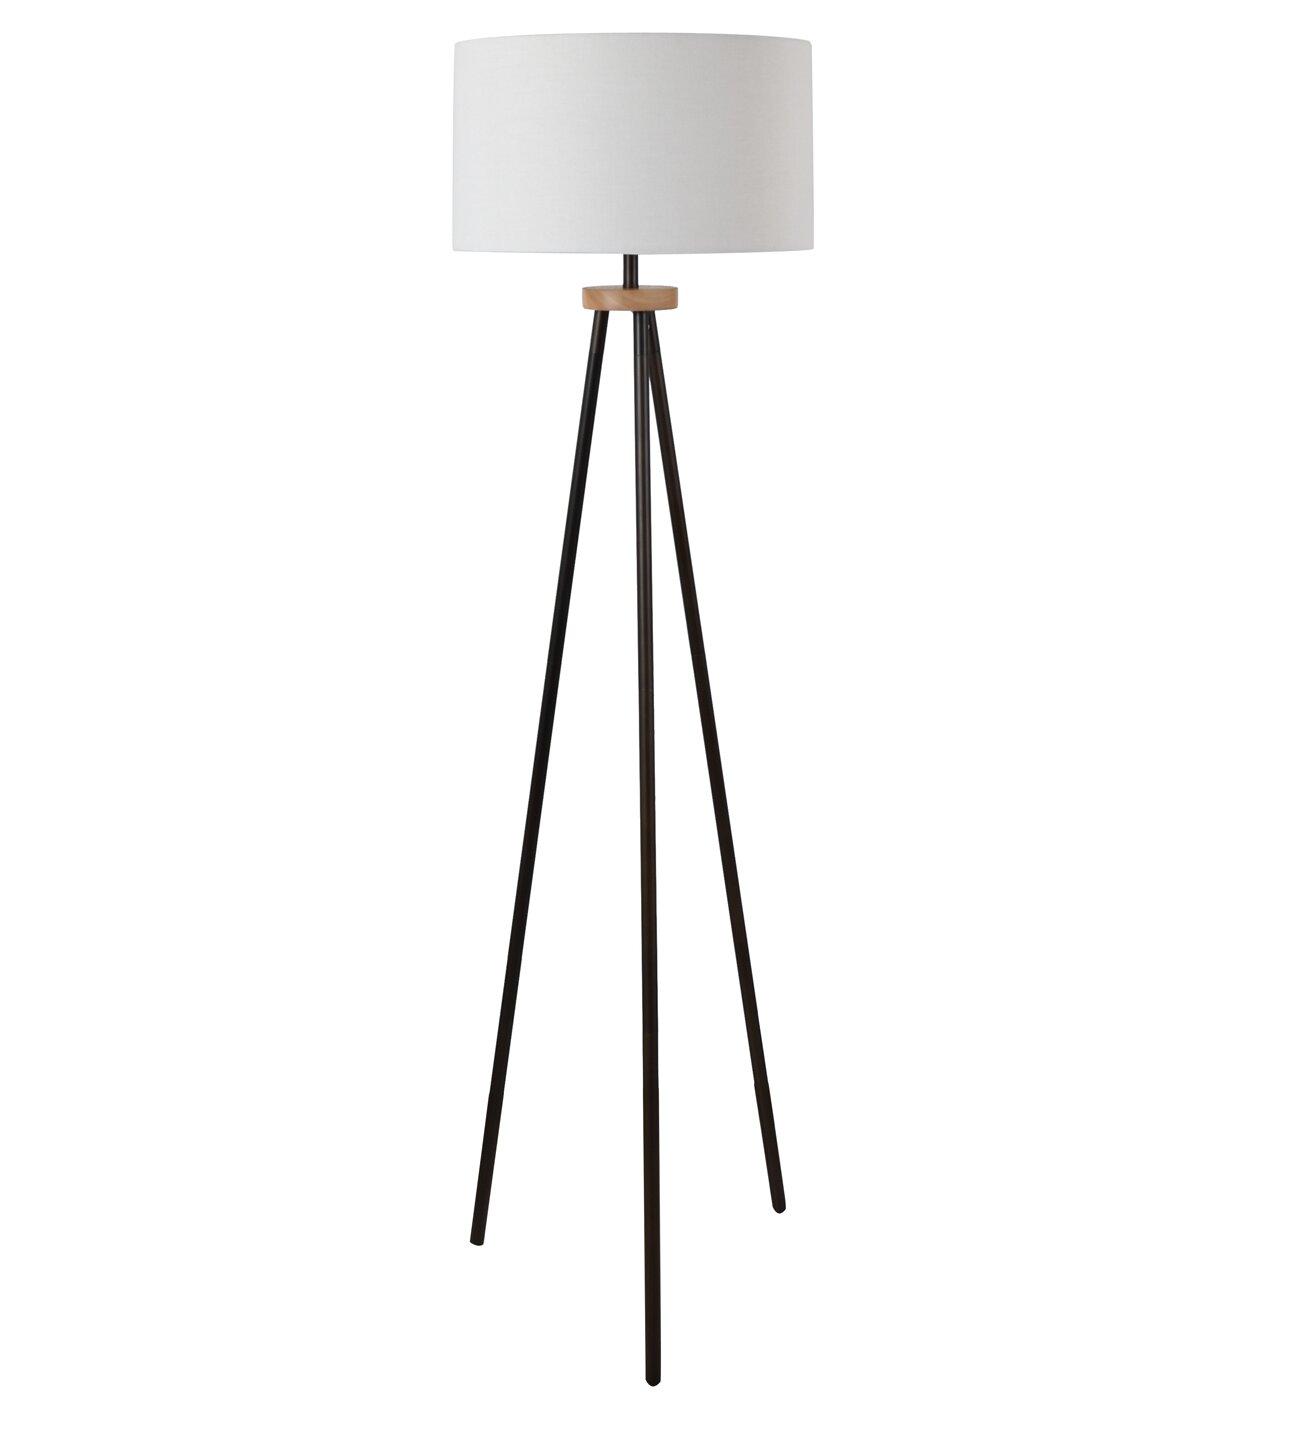 Mccown Retro 62 Tripod Floor Lamp